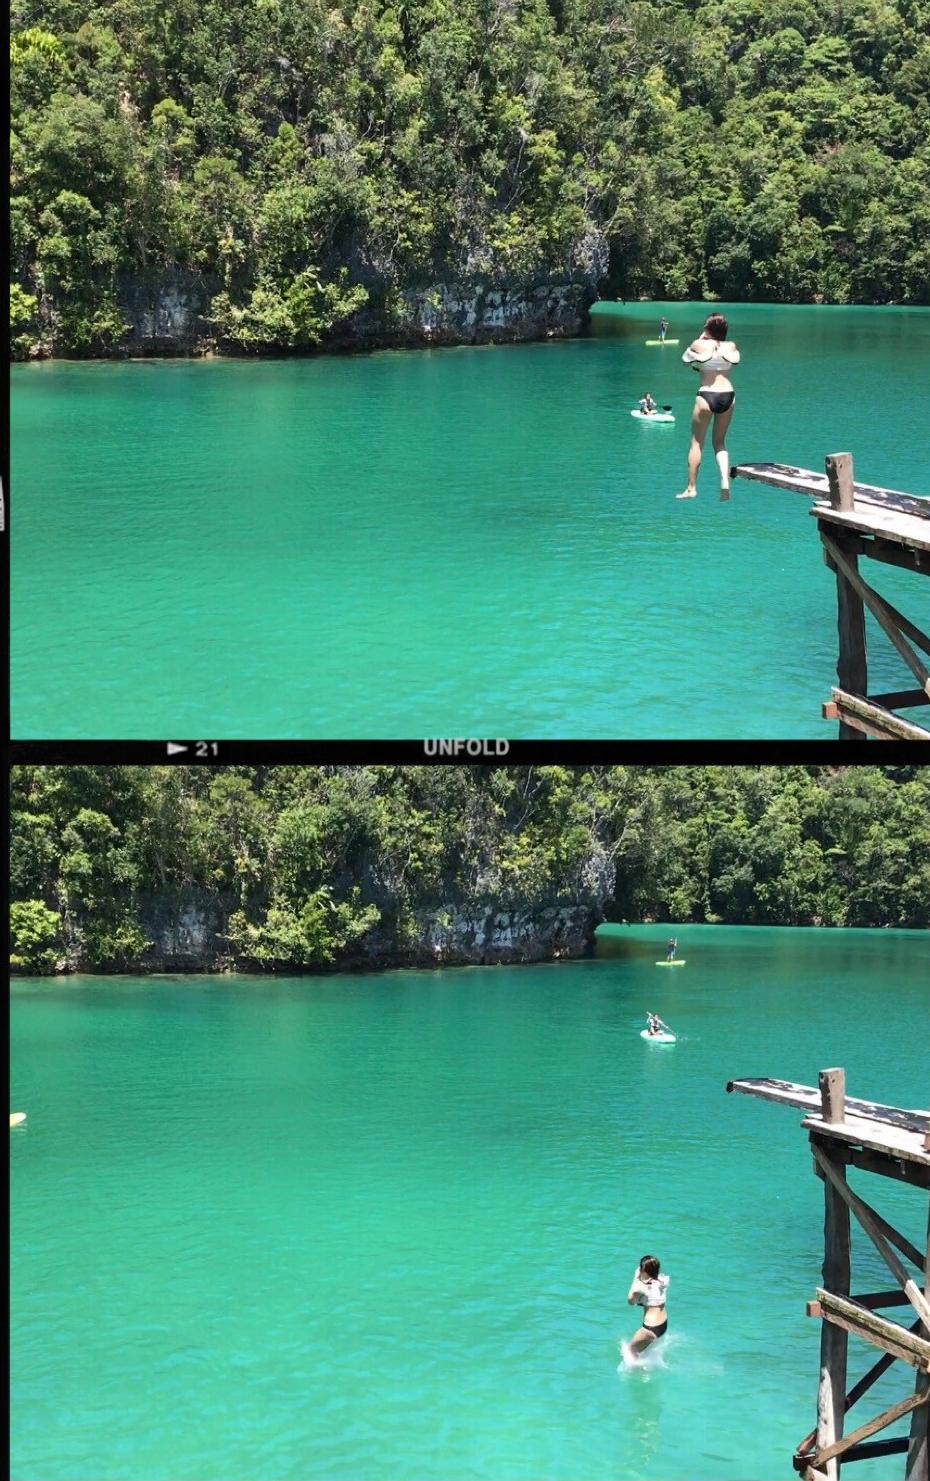 Cliffdiving at the Sugba Lagoon